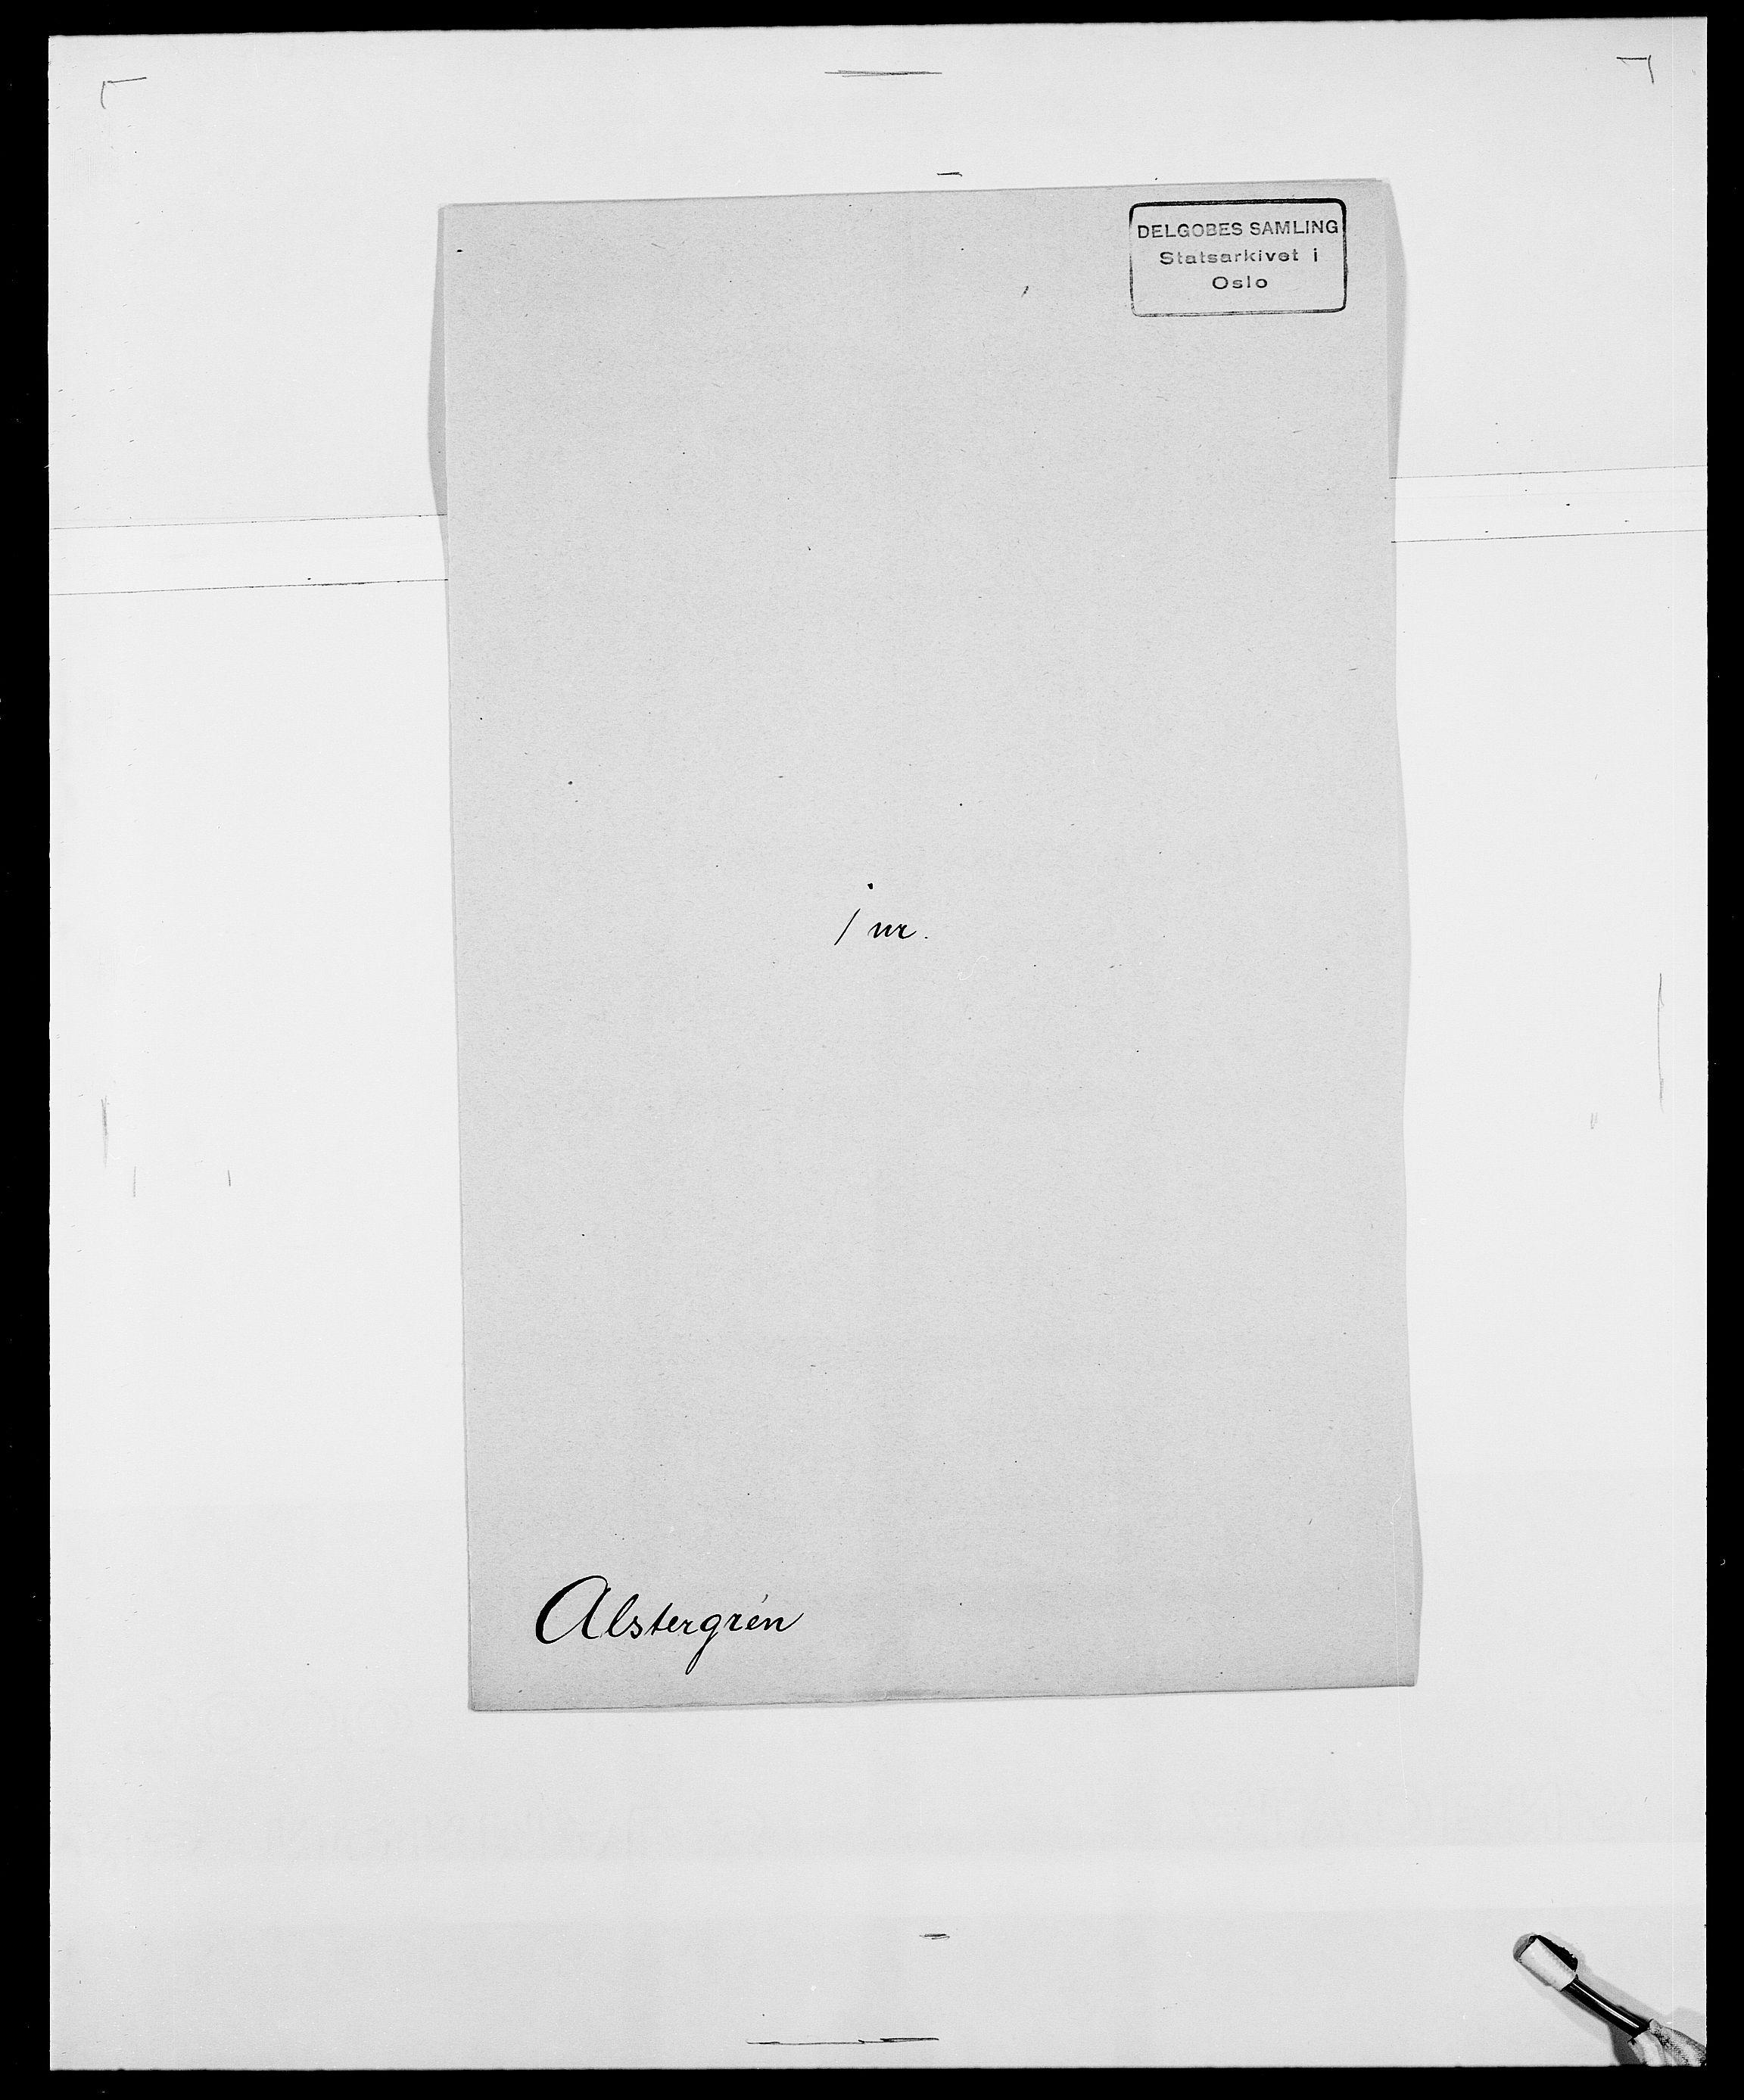 SAO, Delgobe, Charles Antoine - samling, D/Da/L0001: Aabye - Angerman, s. 471